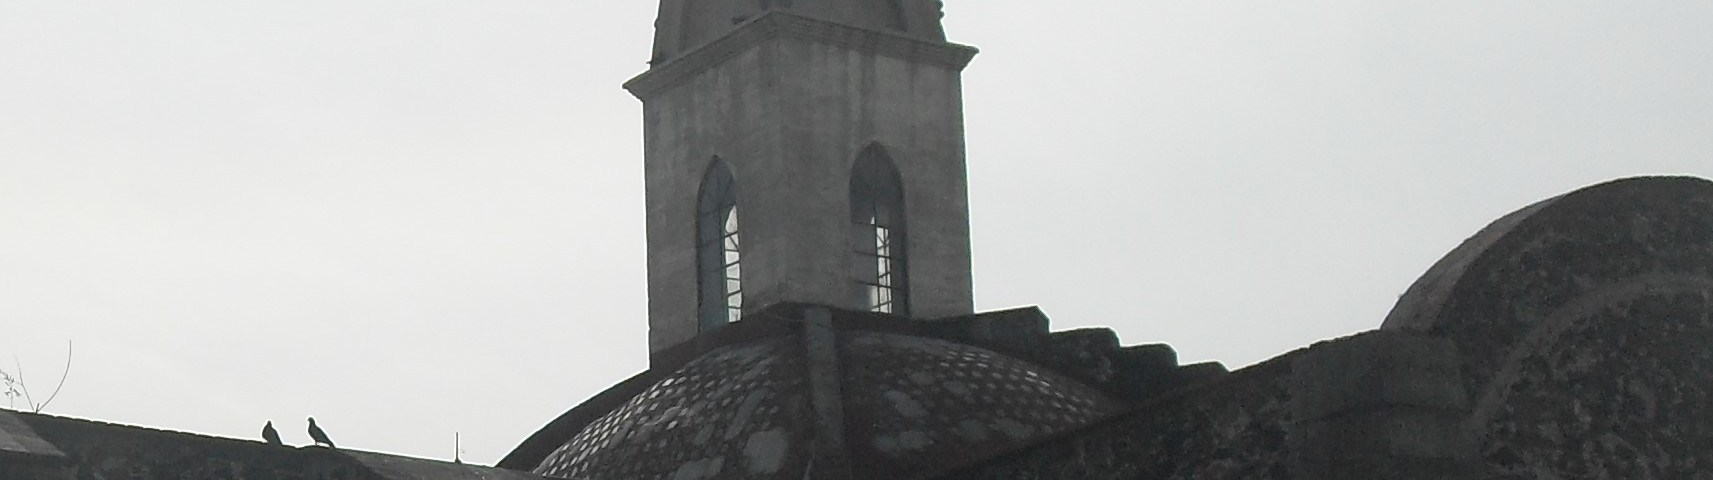 Lateral de Antigua Parroquia de Progreso Hidalgo